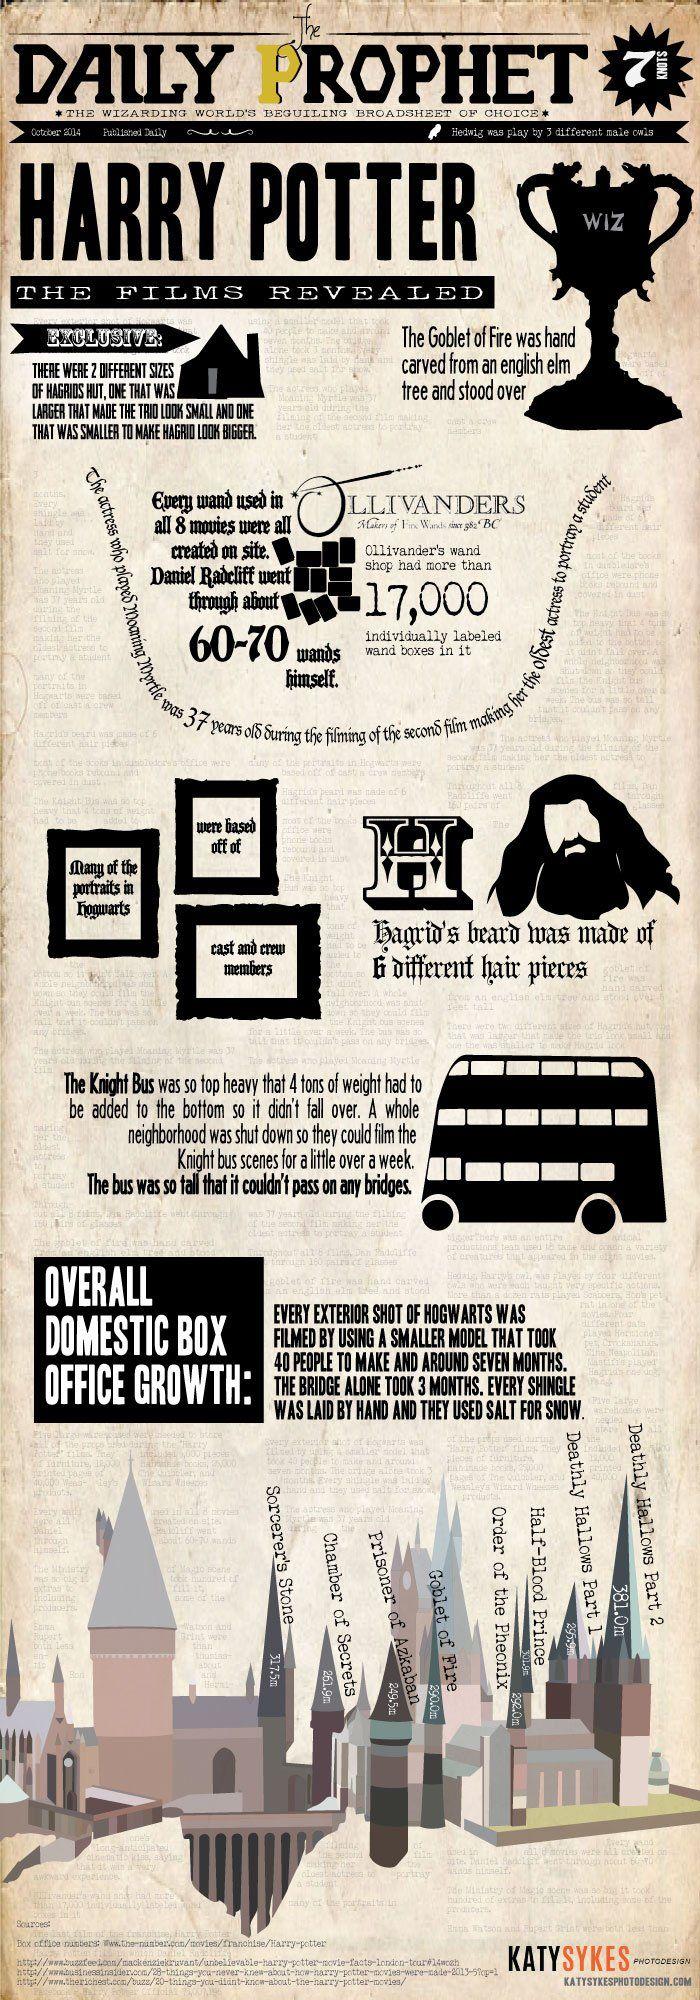 Harry Potter Infographic - Katy Sykes Photodesign